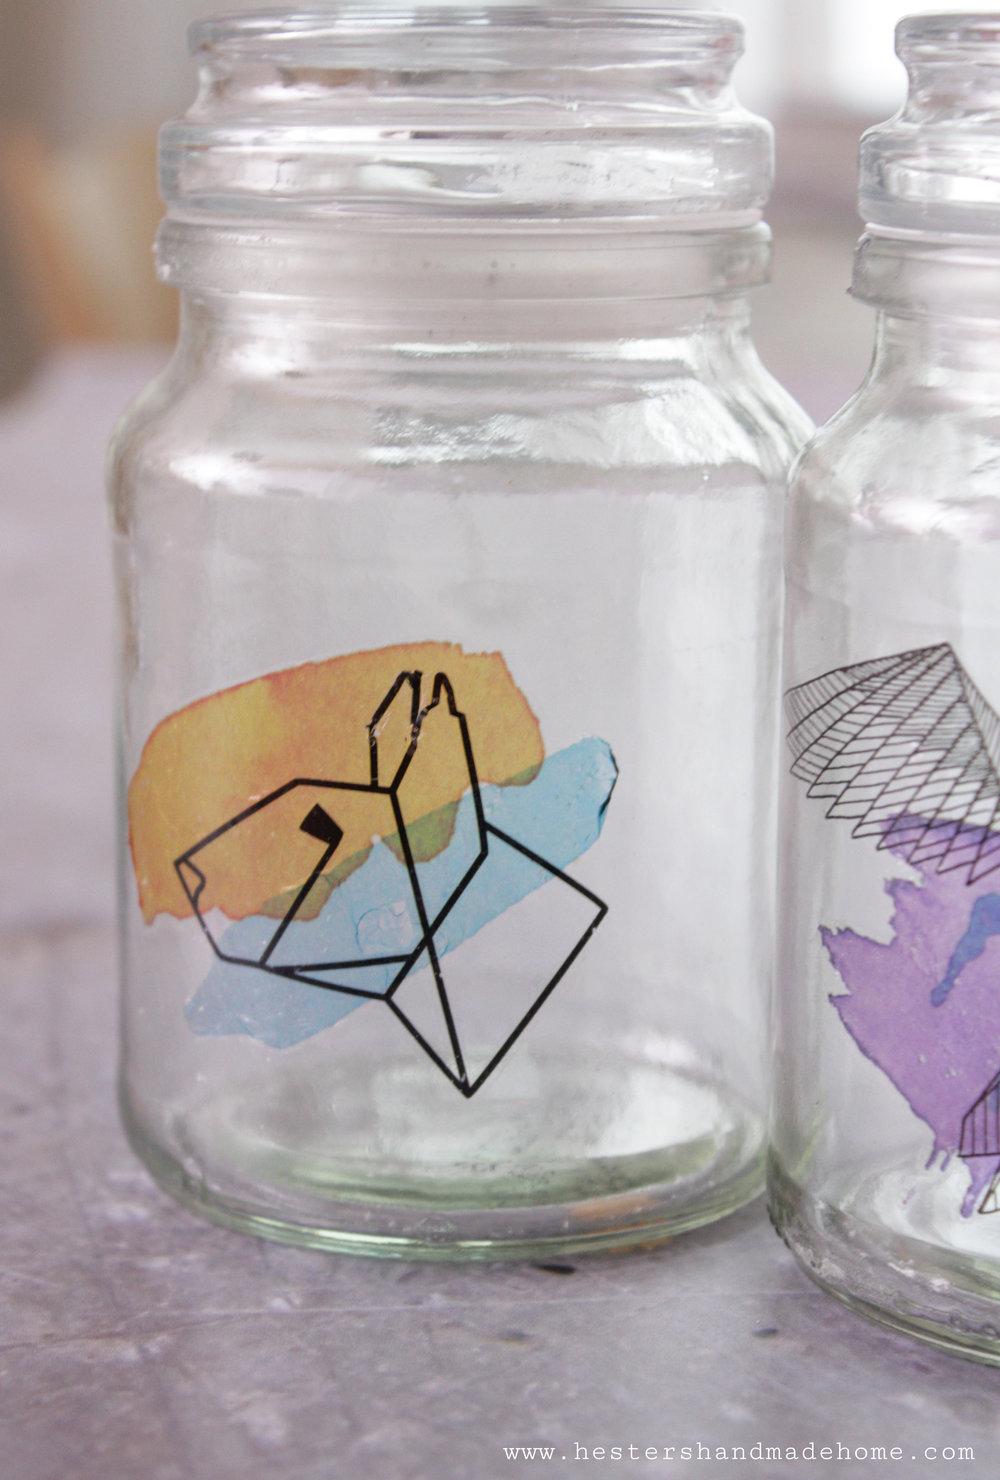 Tattooed jar tutorial by www.hestershandmadehome.com